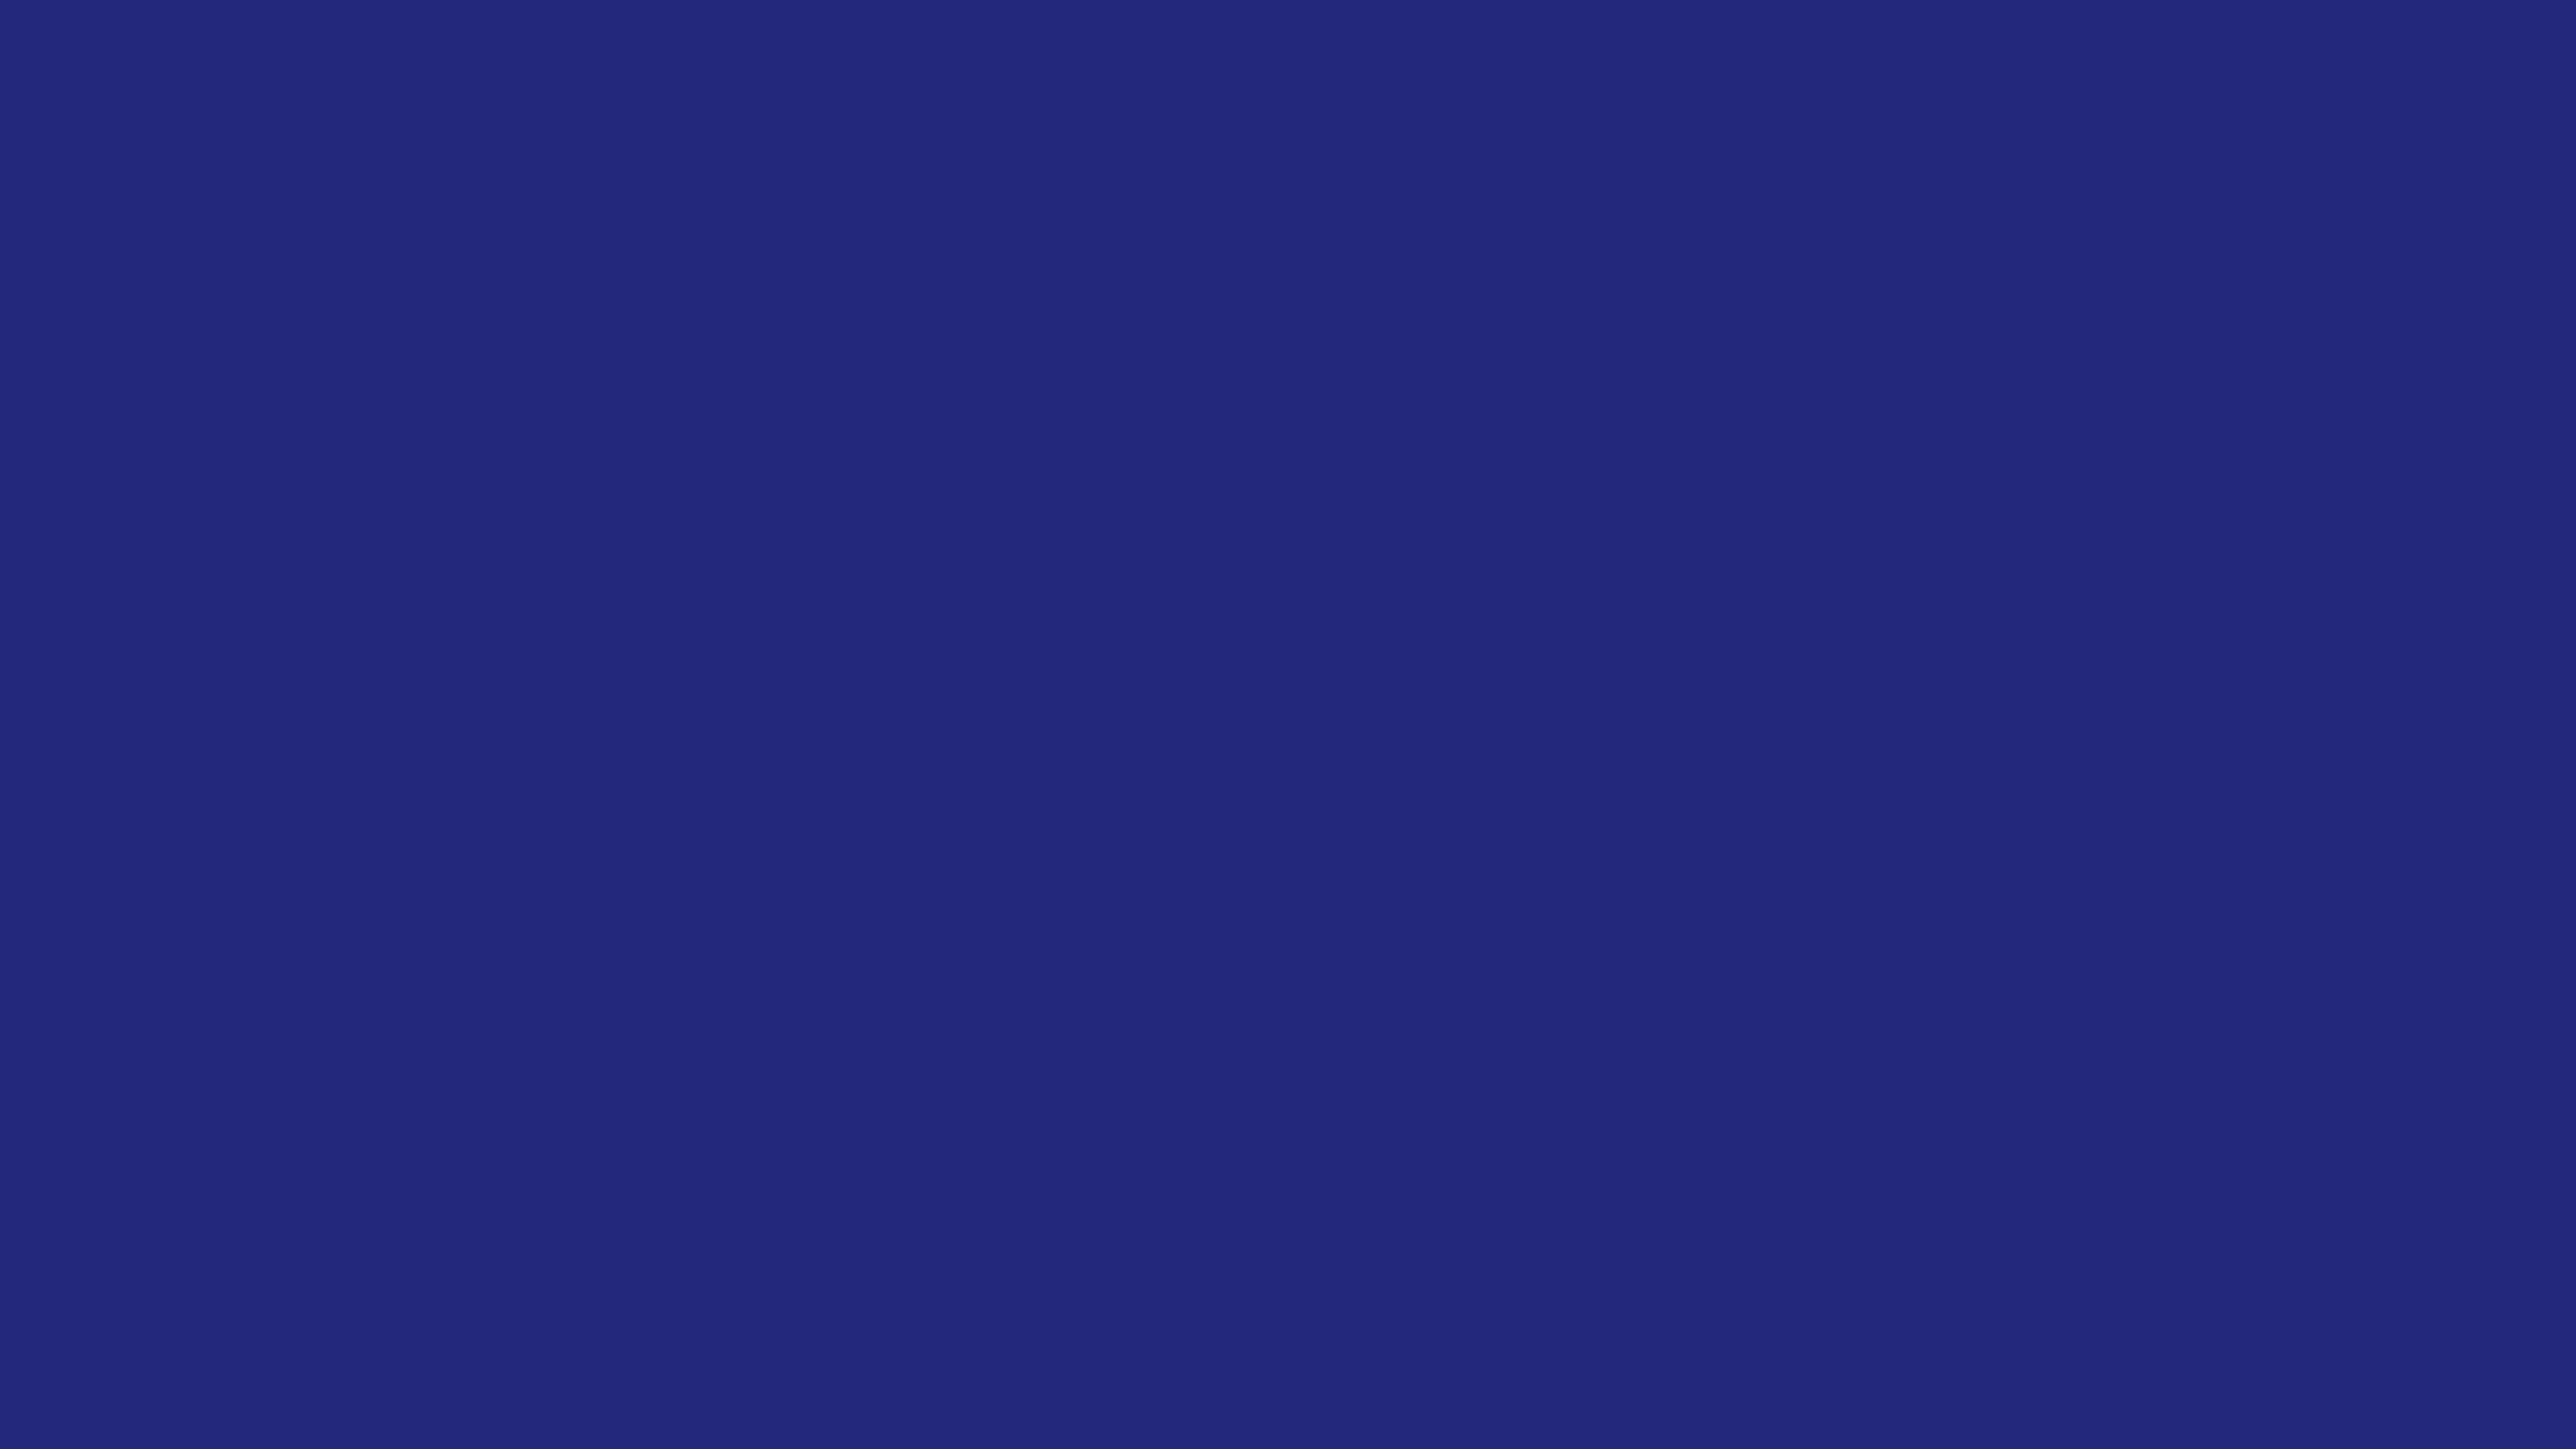 3840x2160 St Patricks Blue Solid Color Background